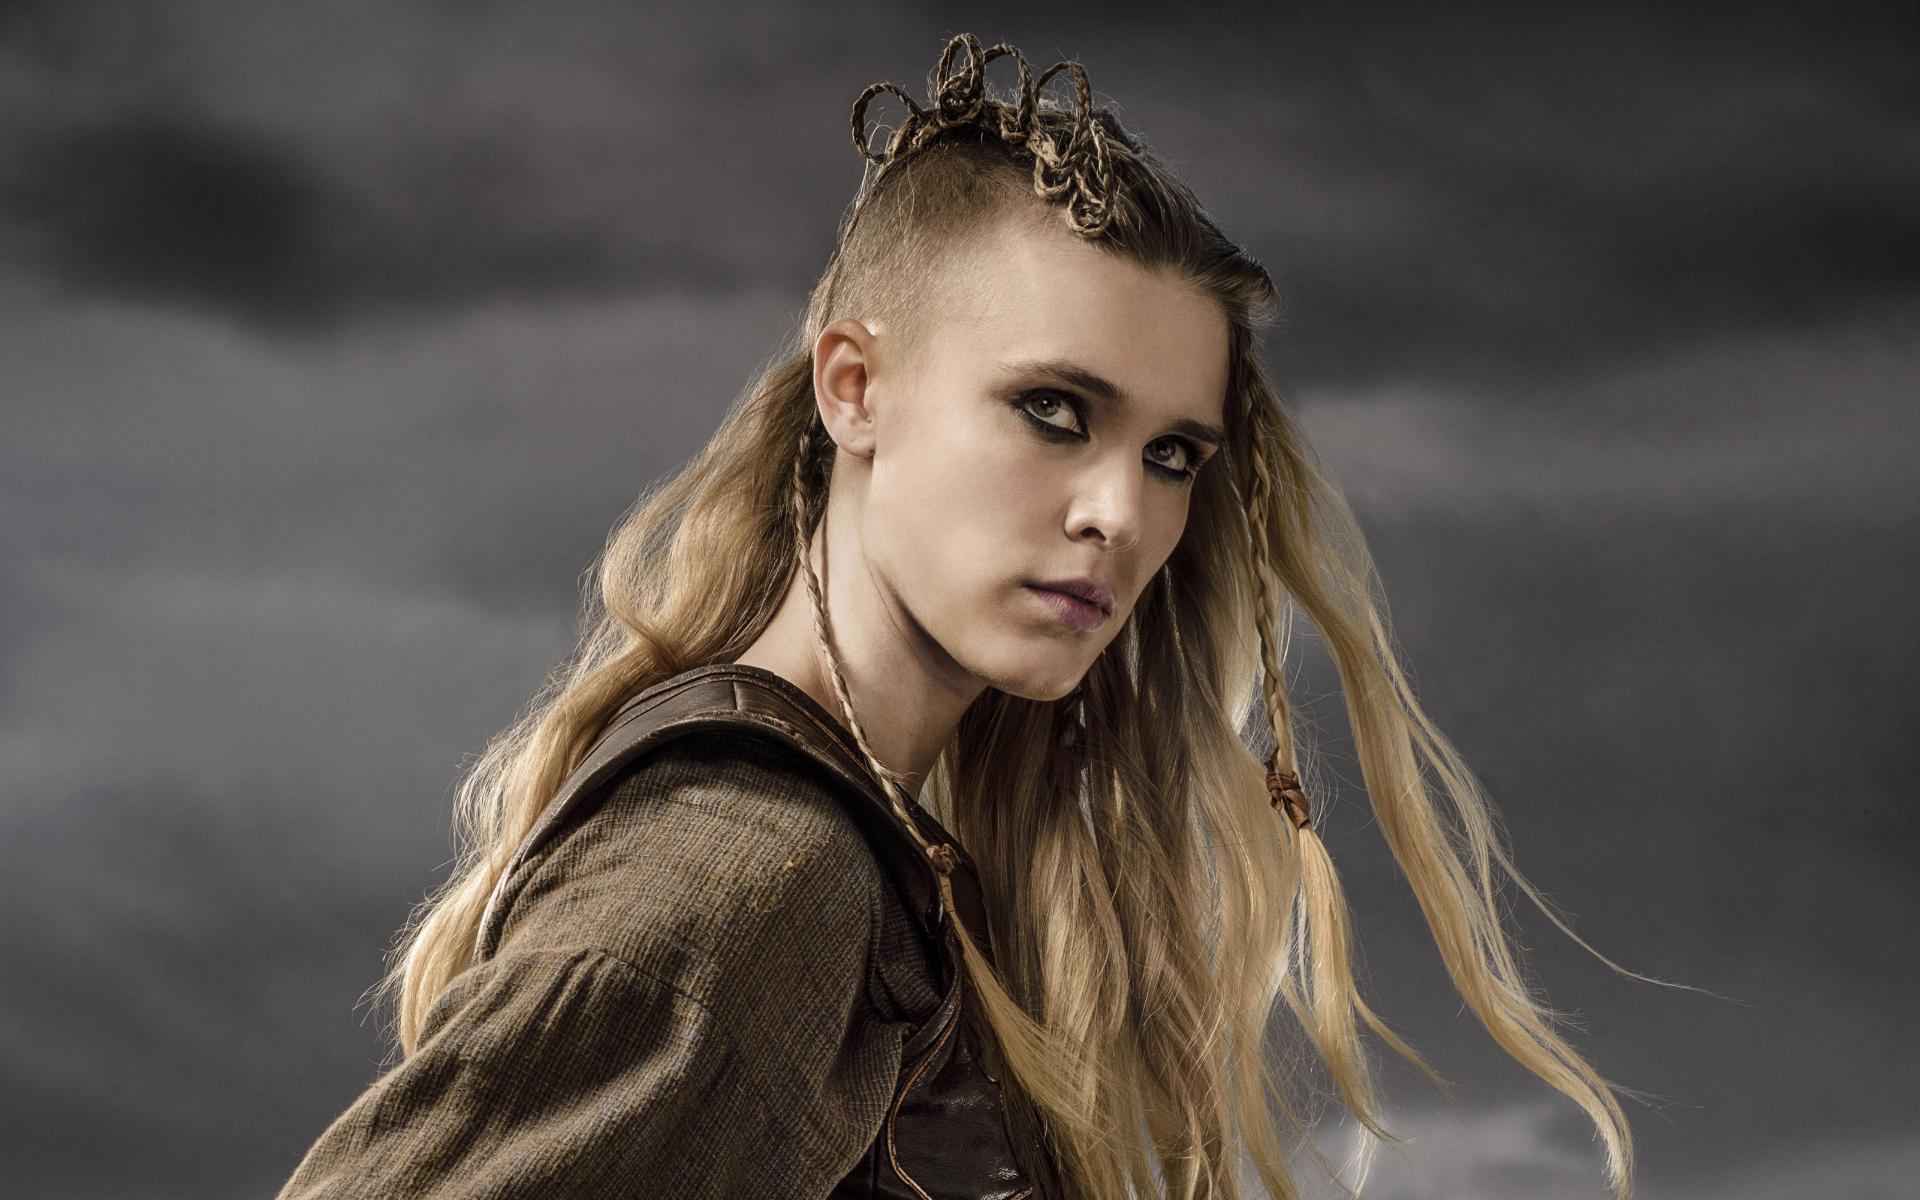 Porunn vikings hd 4k wallpaper - Hollywood actress full hd wallpaper ...